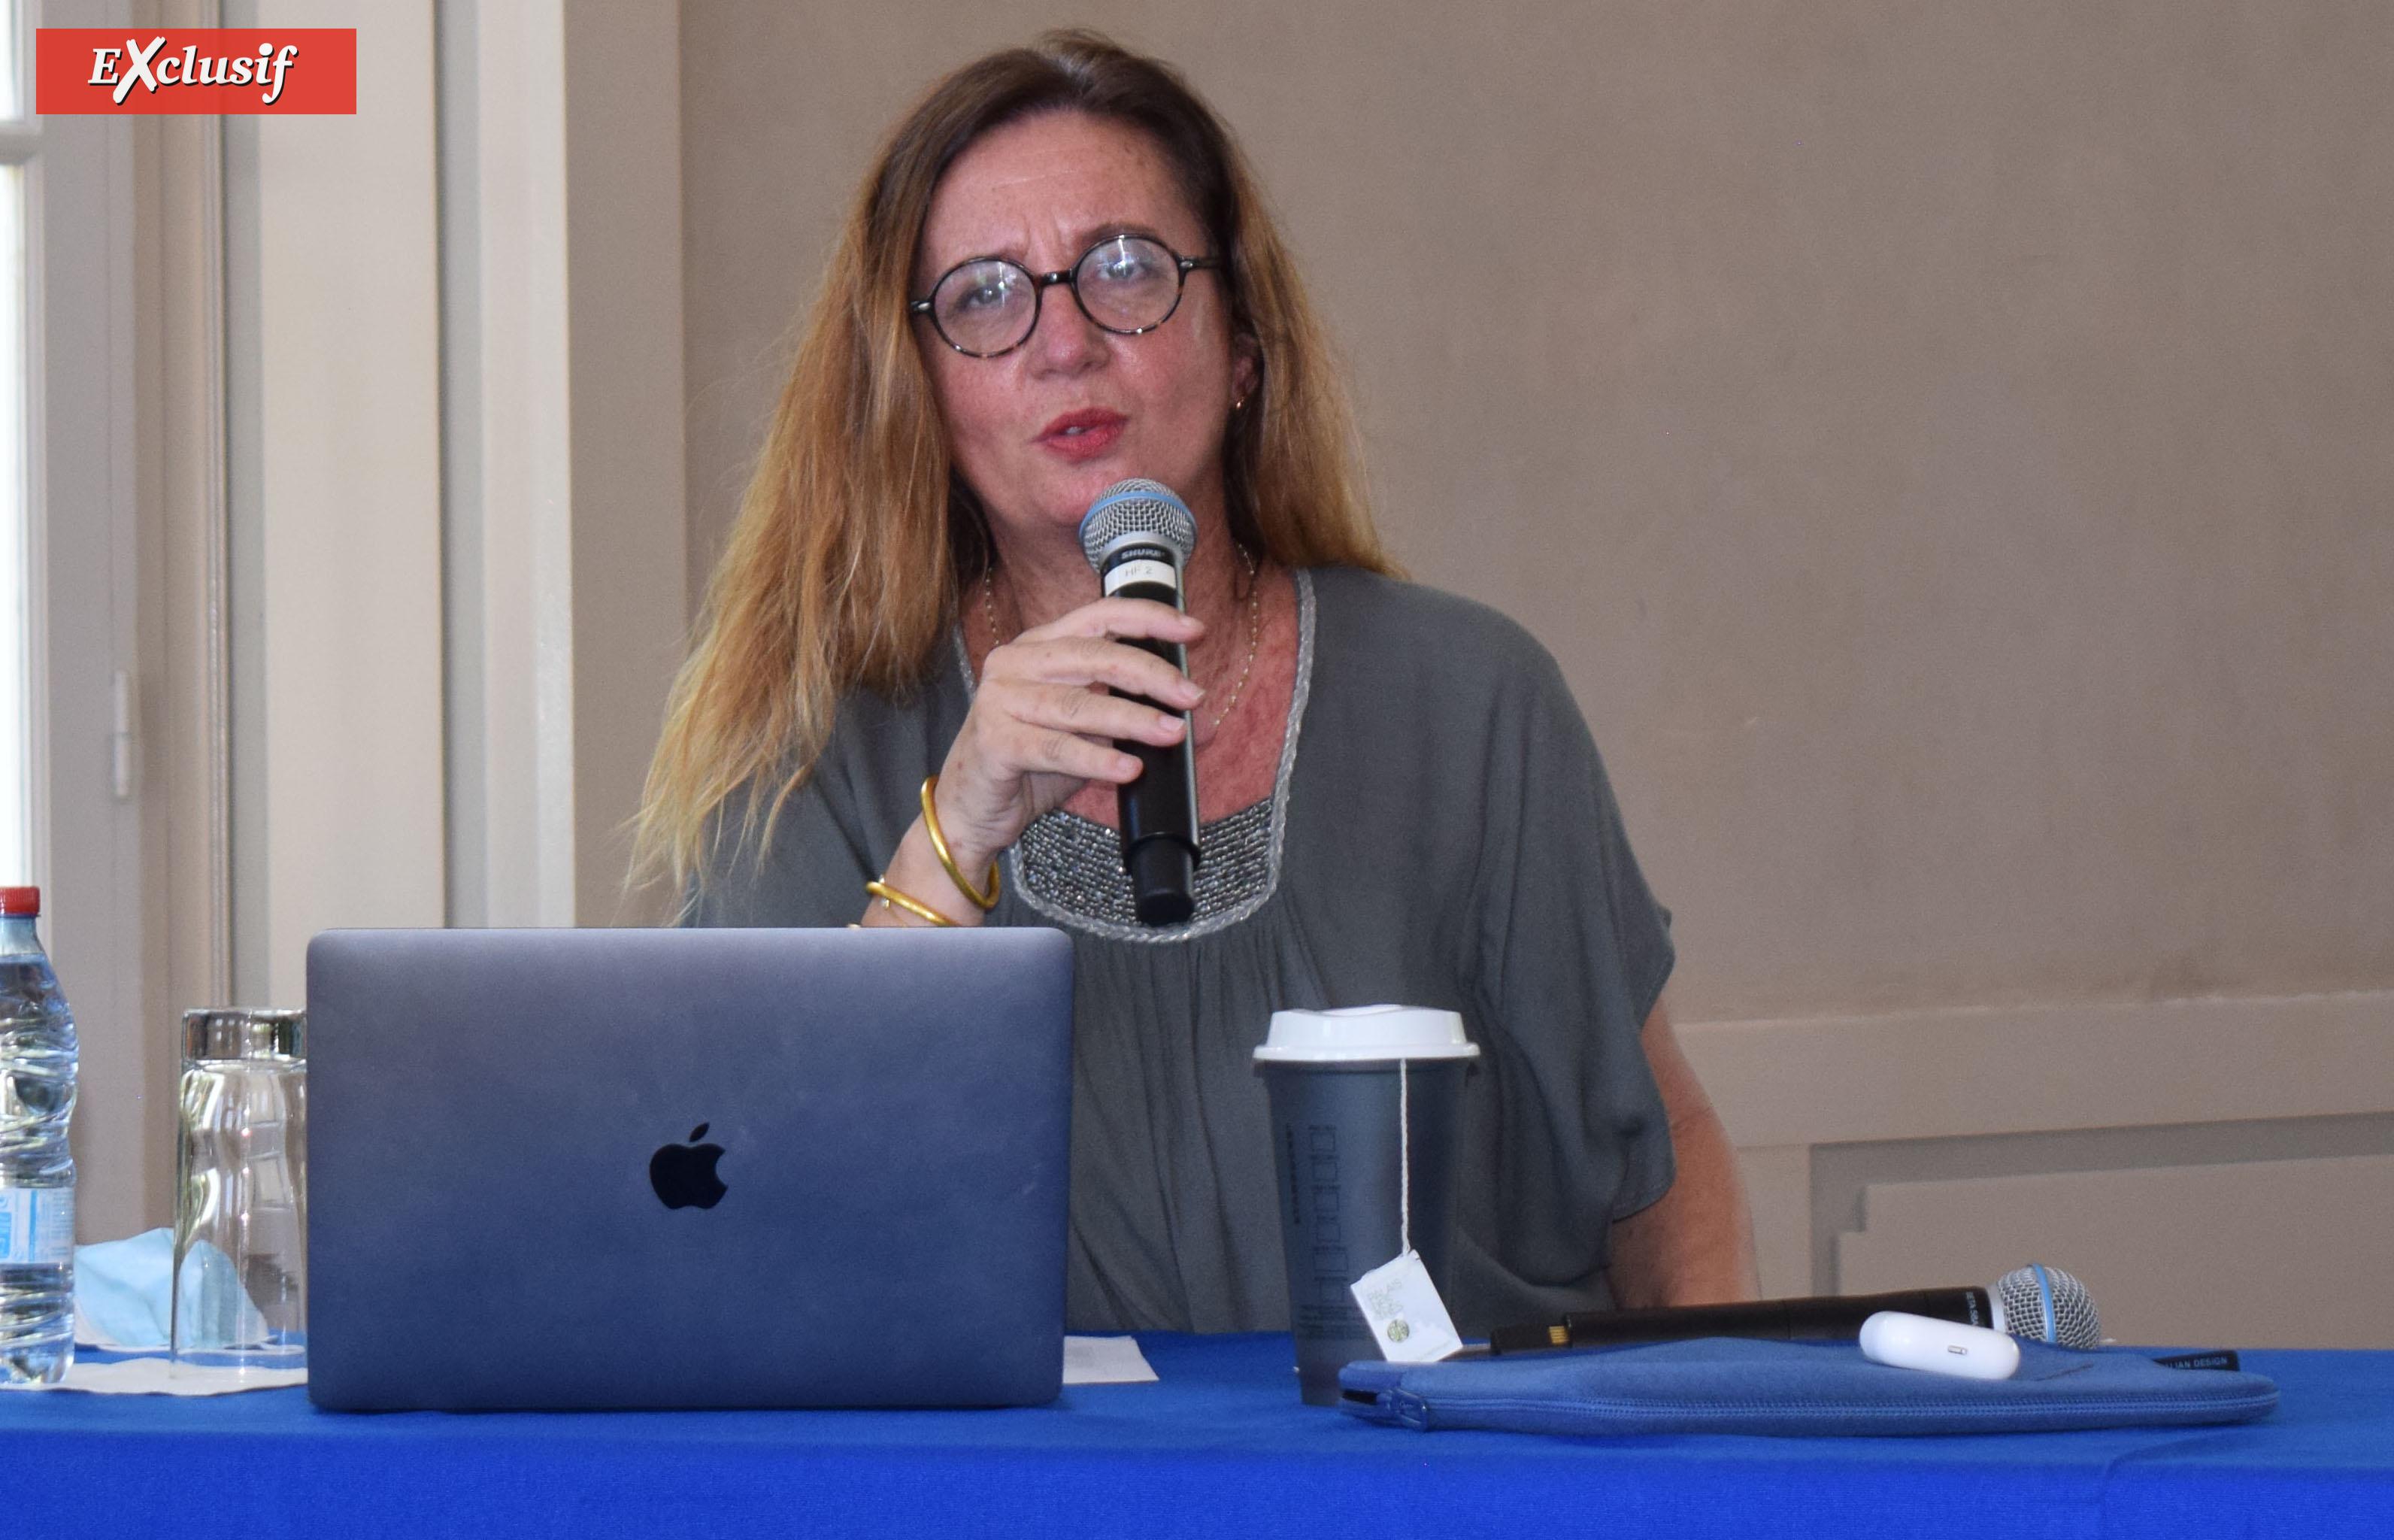 Estelle Jomaron, productrice et coordinatrice de ce projet